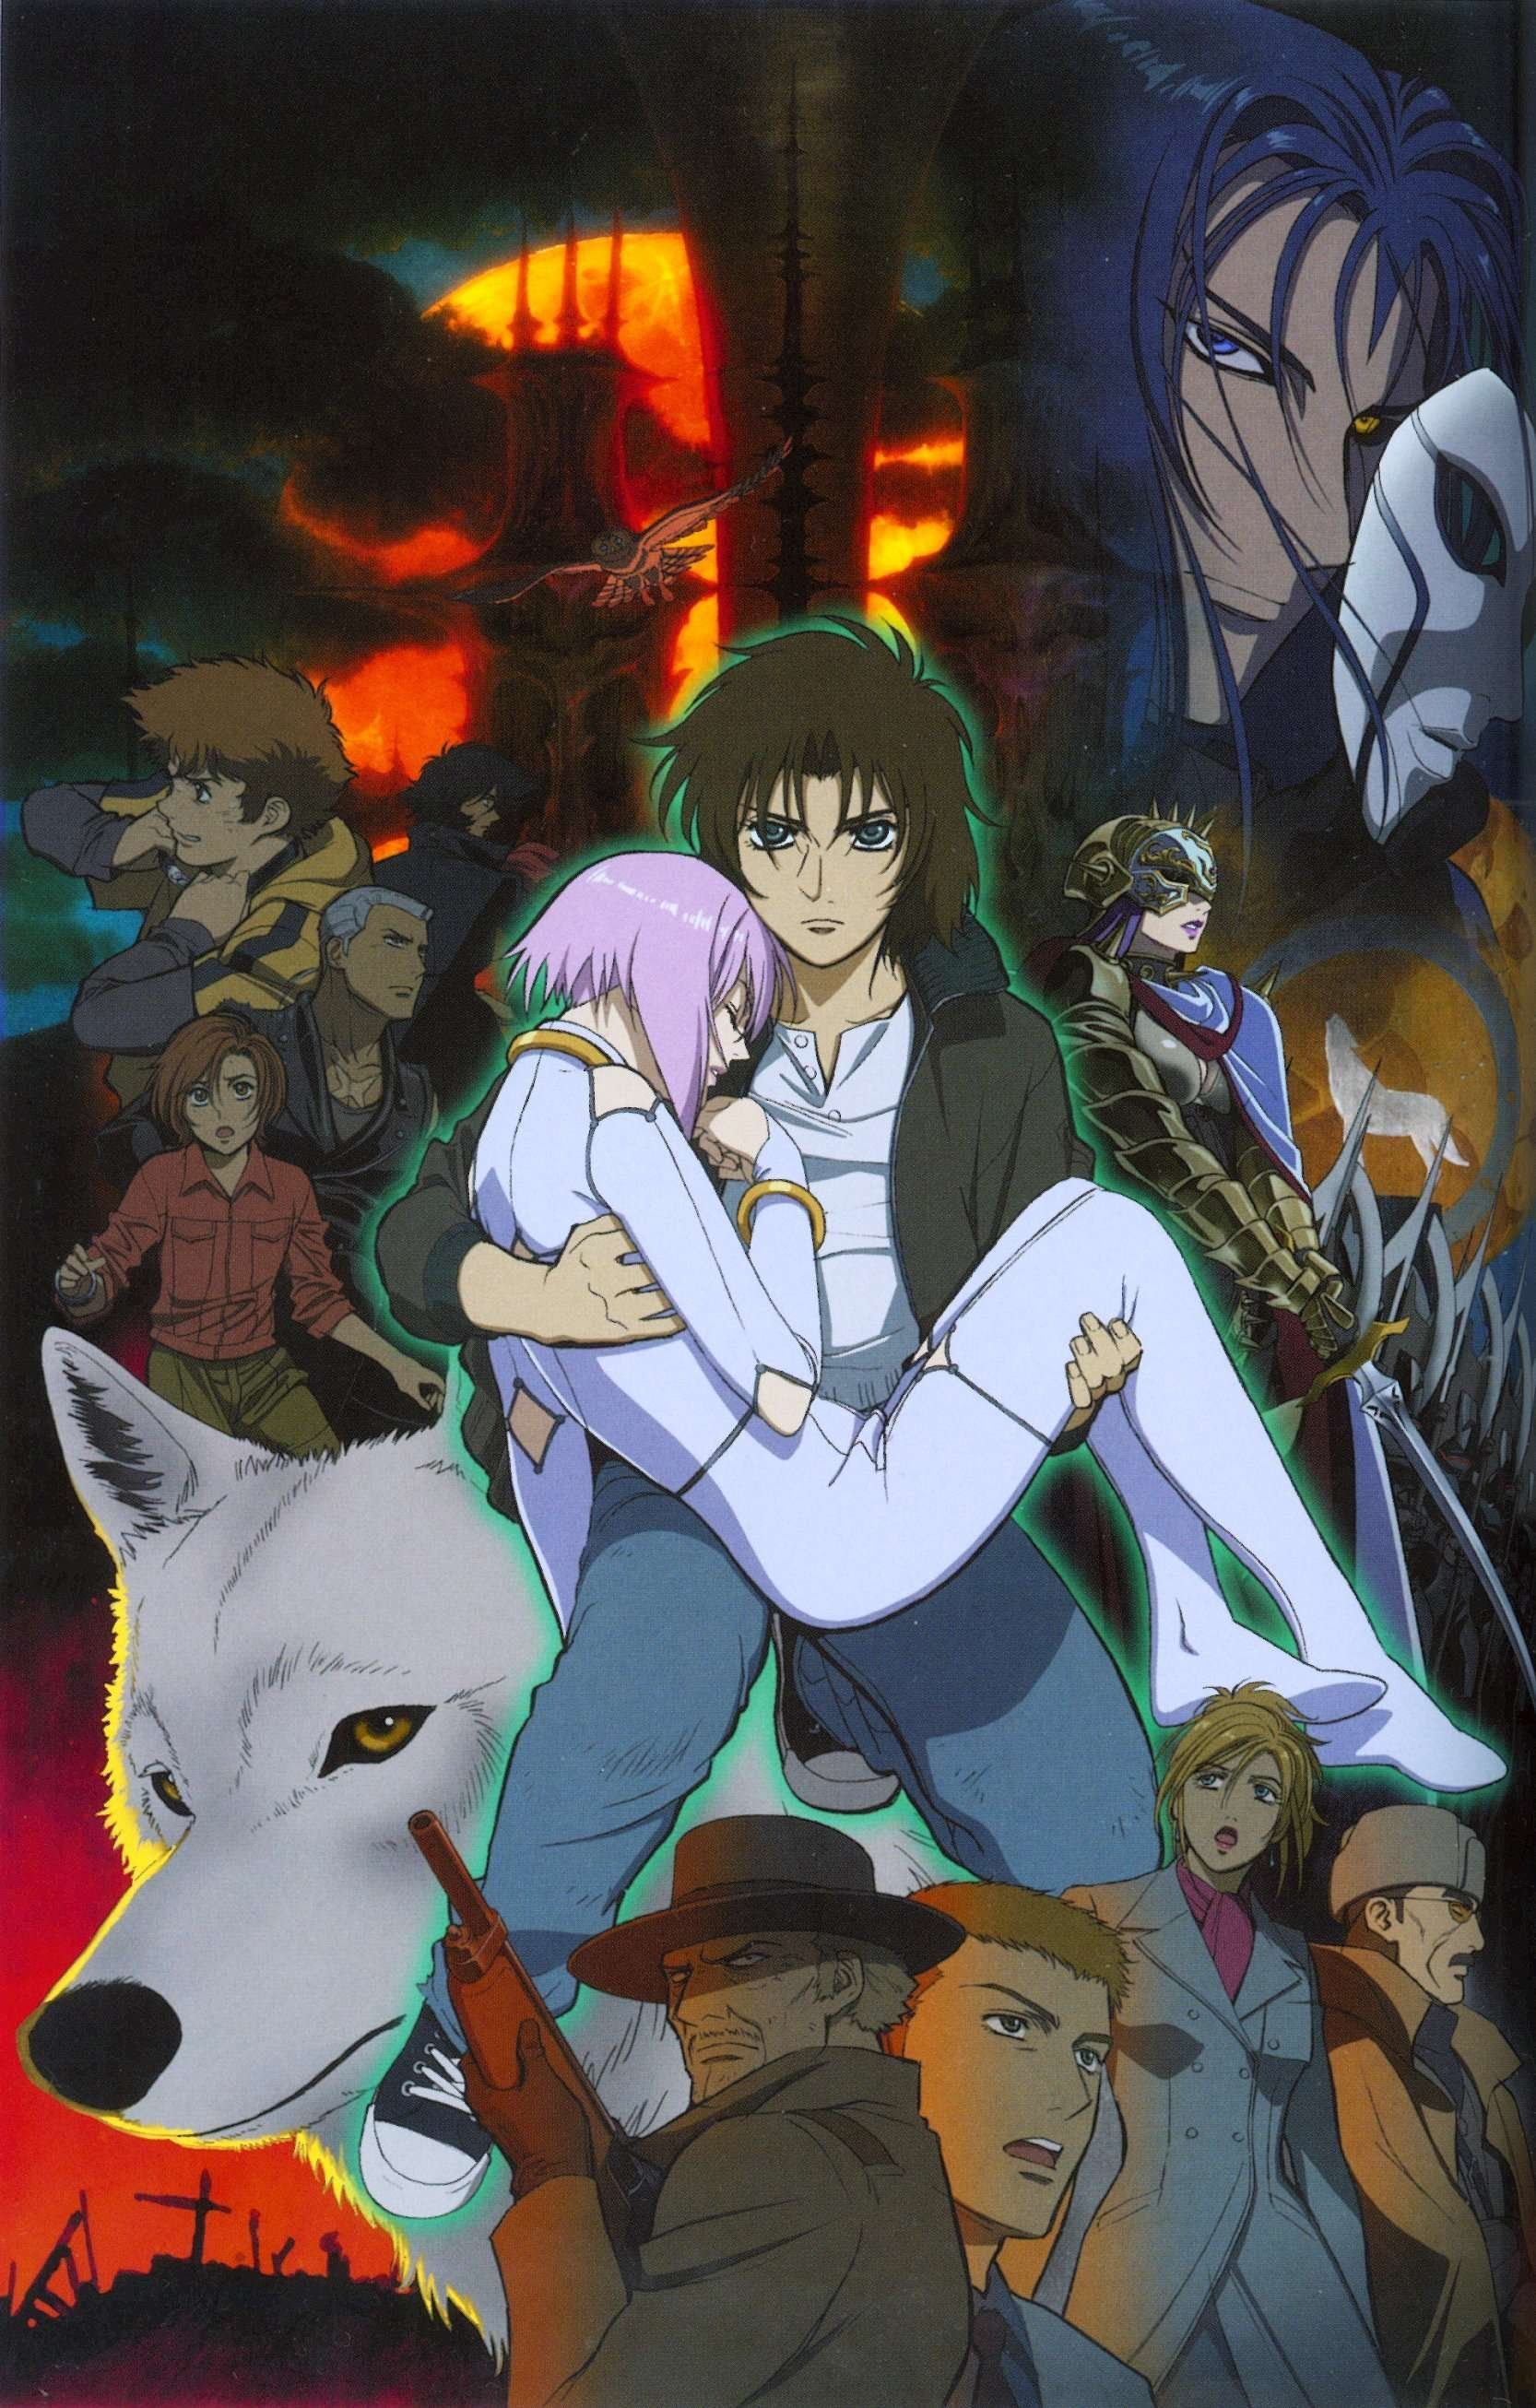 Pin by olga on wolfs rain wolfs rain anime wolf anime